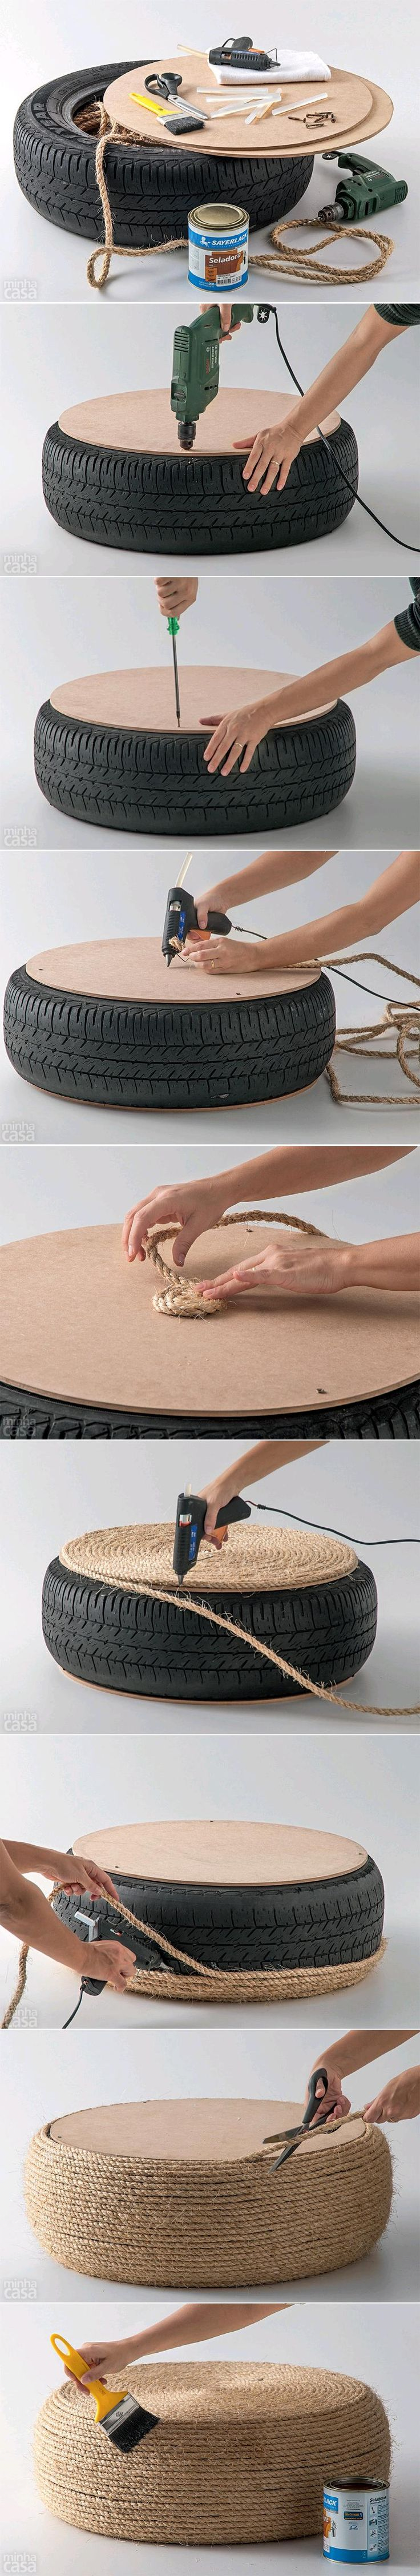 DIY Tire Ottoman DIY Tire Ottoman